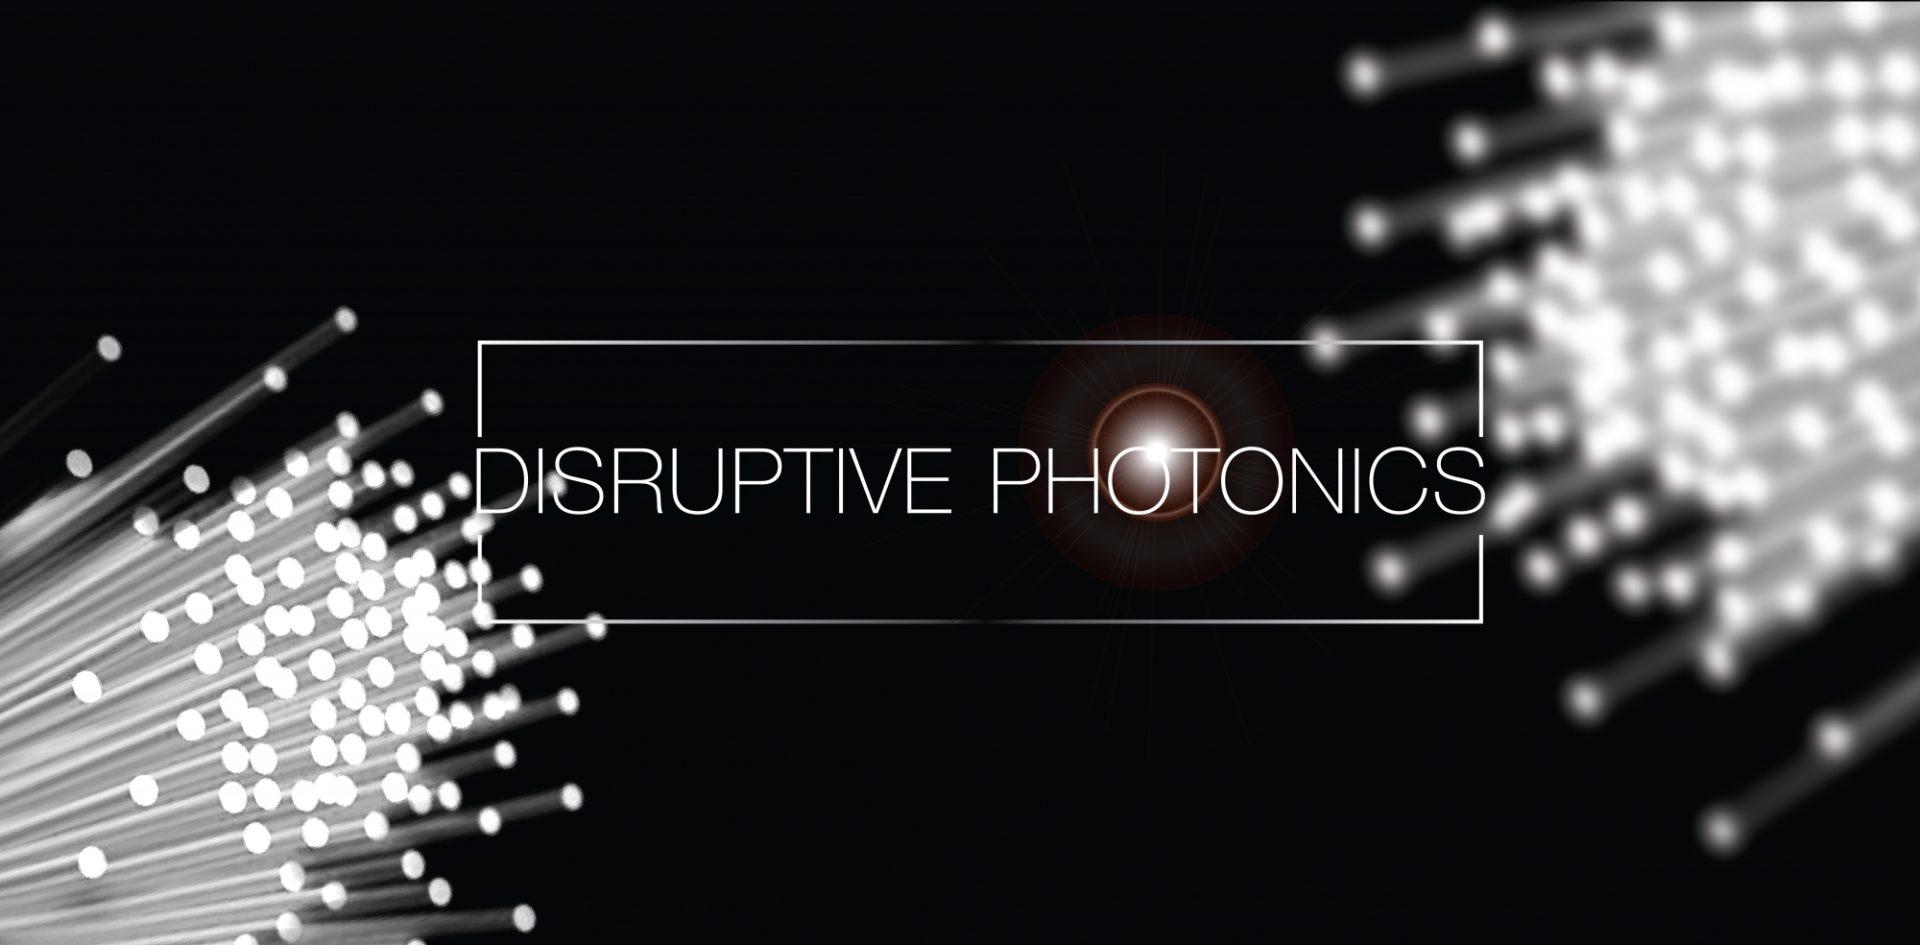 distruptive photonics, femtosecond laser, fiber bragg gratings, FBG, fiber lasers, monolithic fiber lasers